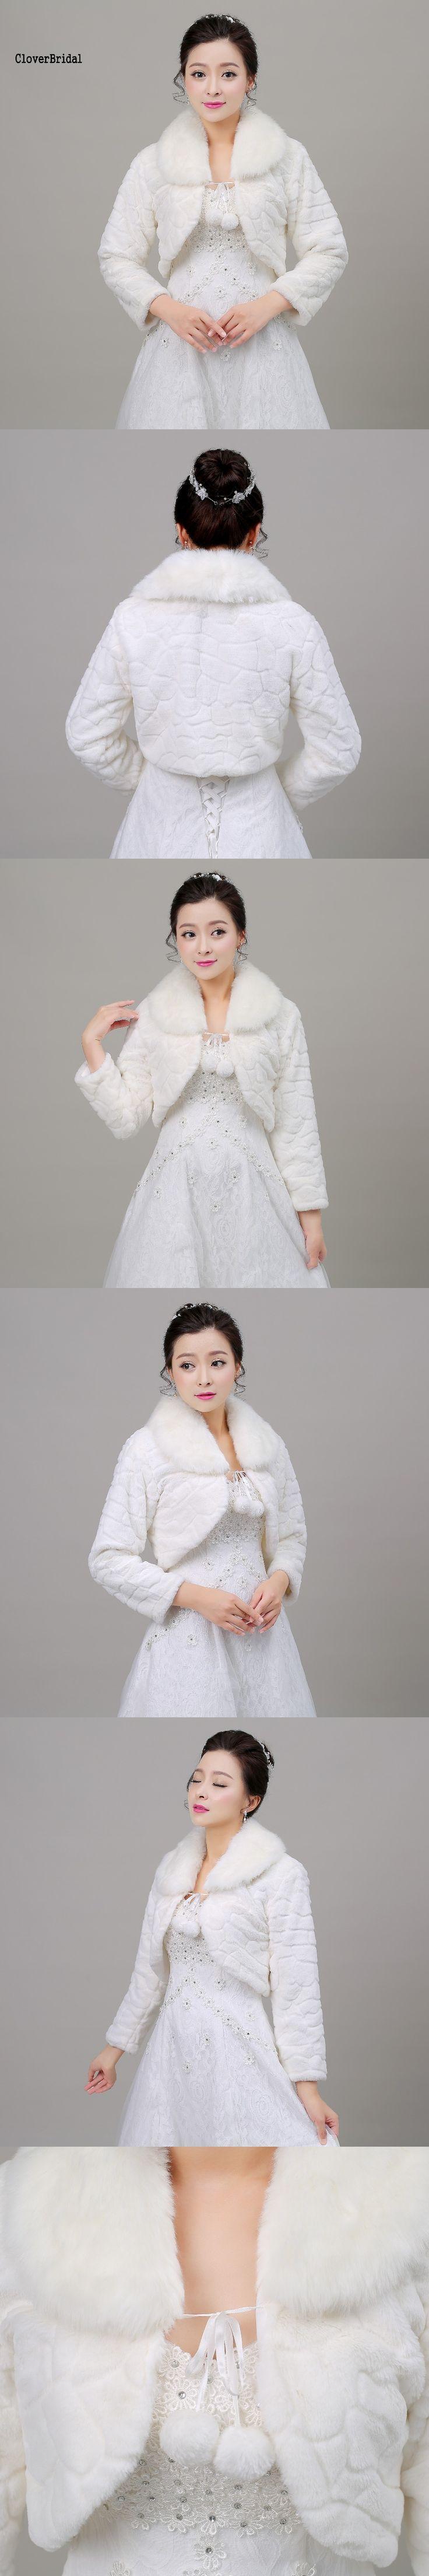 New Noble Modern Two Colors White Brown Fur Cape Mariage Jacket Women Winter Faux Fur Wraps Coats Women Outdoor Accessories